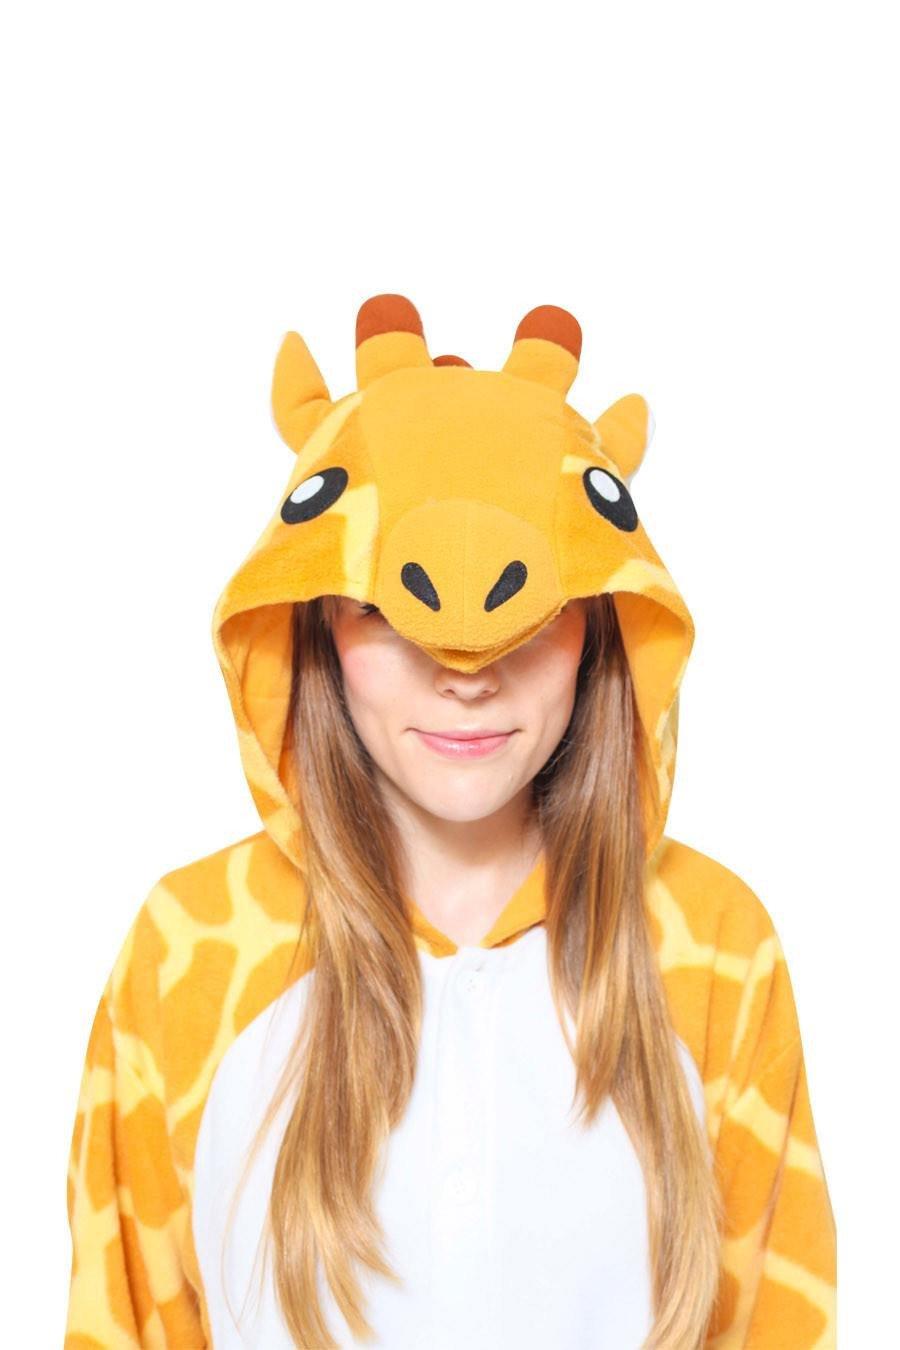 Купить кигуруми жираф в СПб недорого